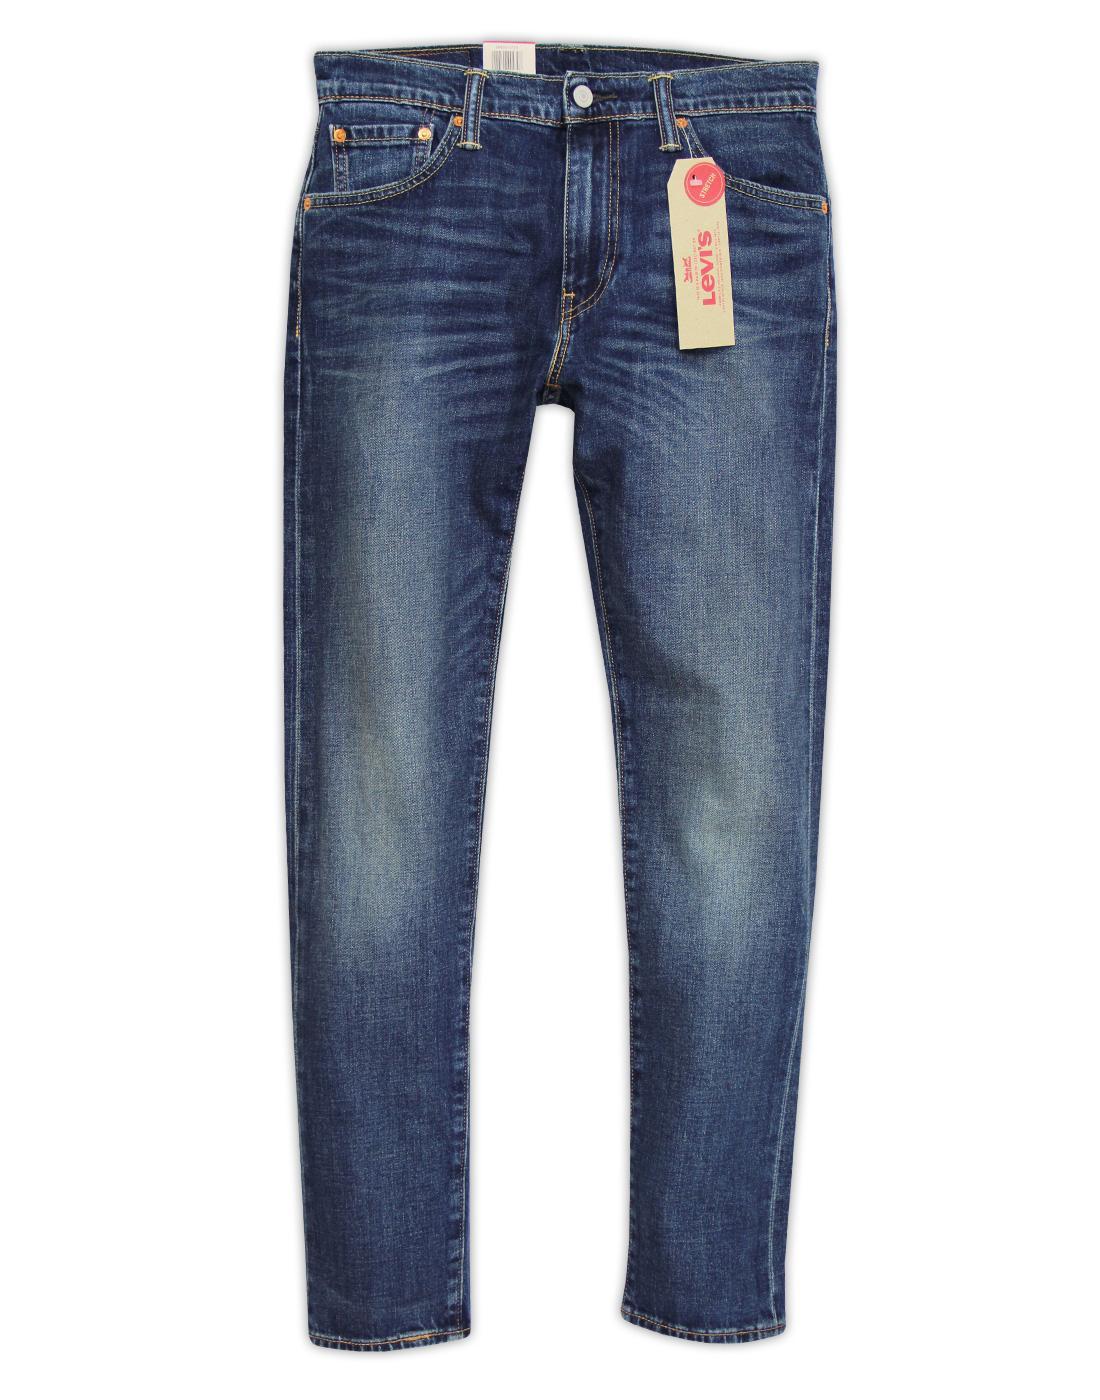 Brand new LEVI'S 512 Madison Square Retro Mod Slim Taper Fit Denim Jeans CZ76